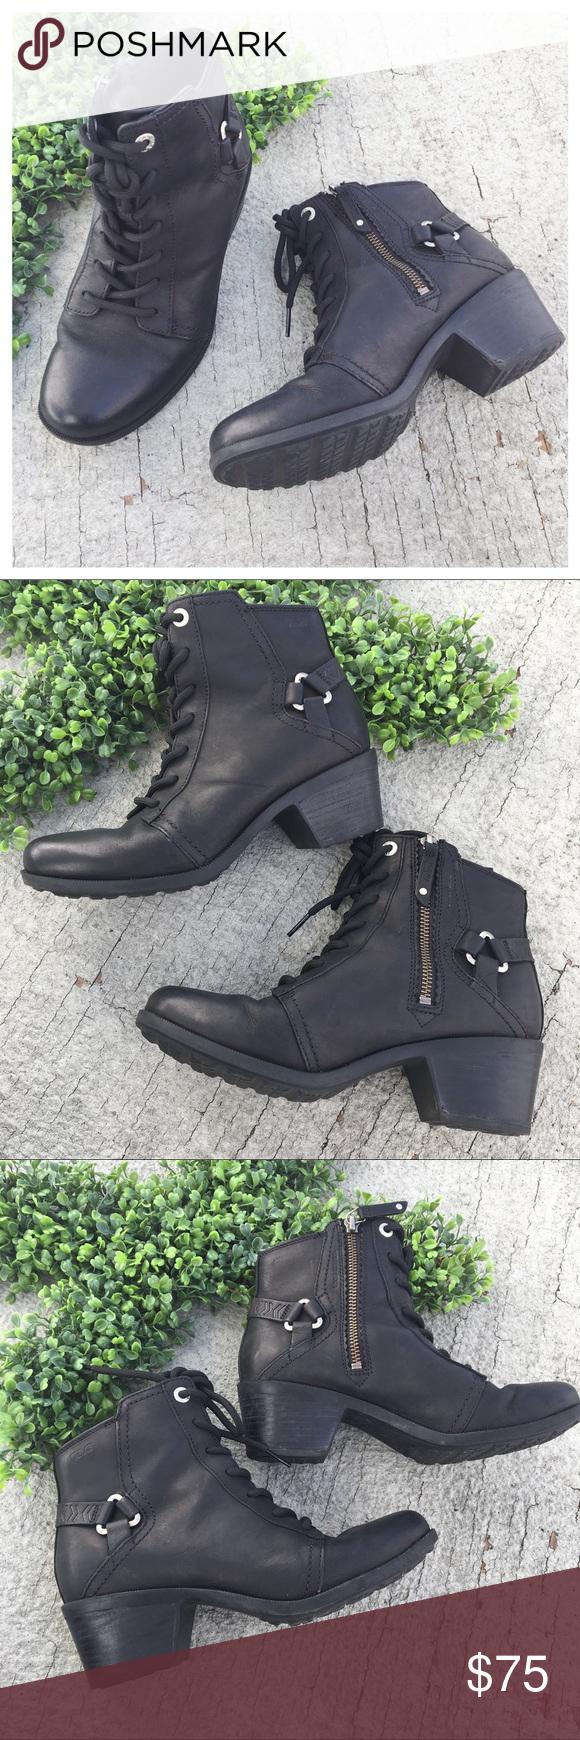 Teva Foxy Lace Up Waterproof Boots